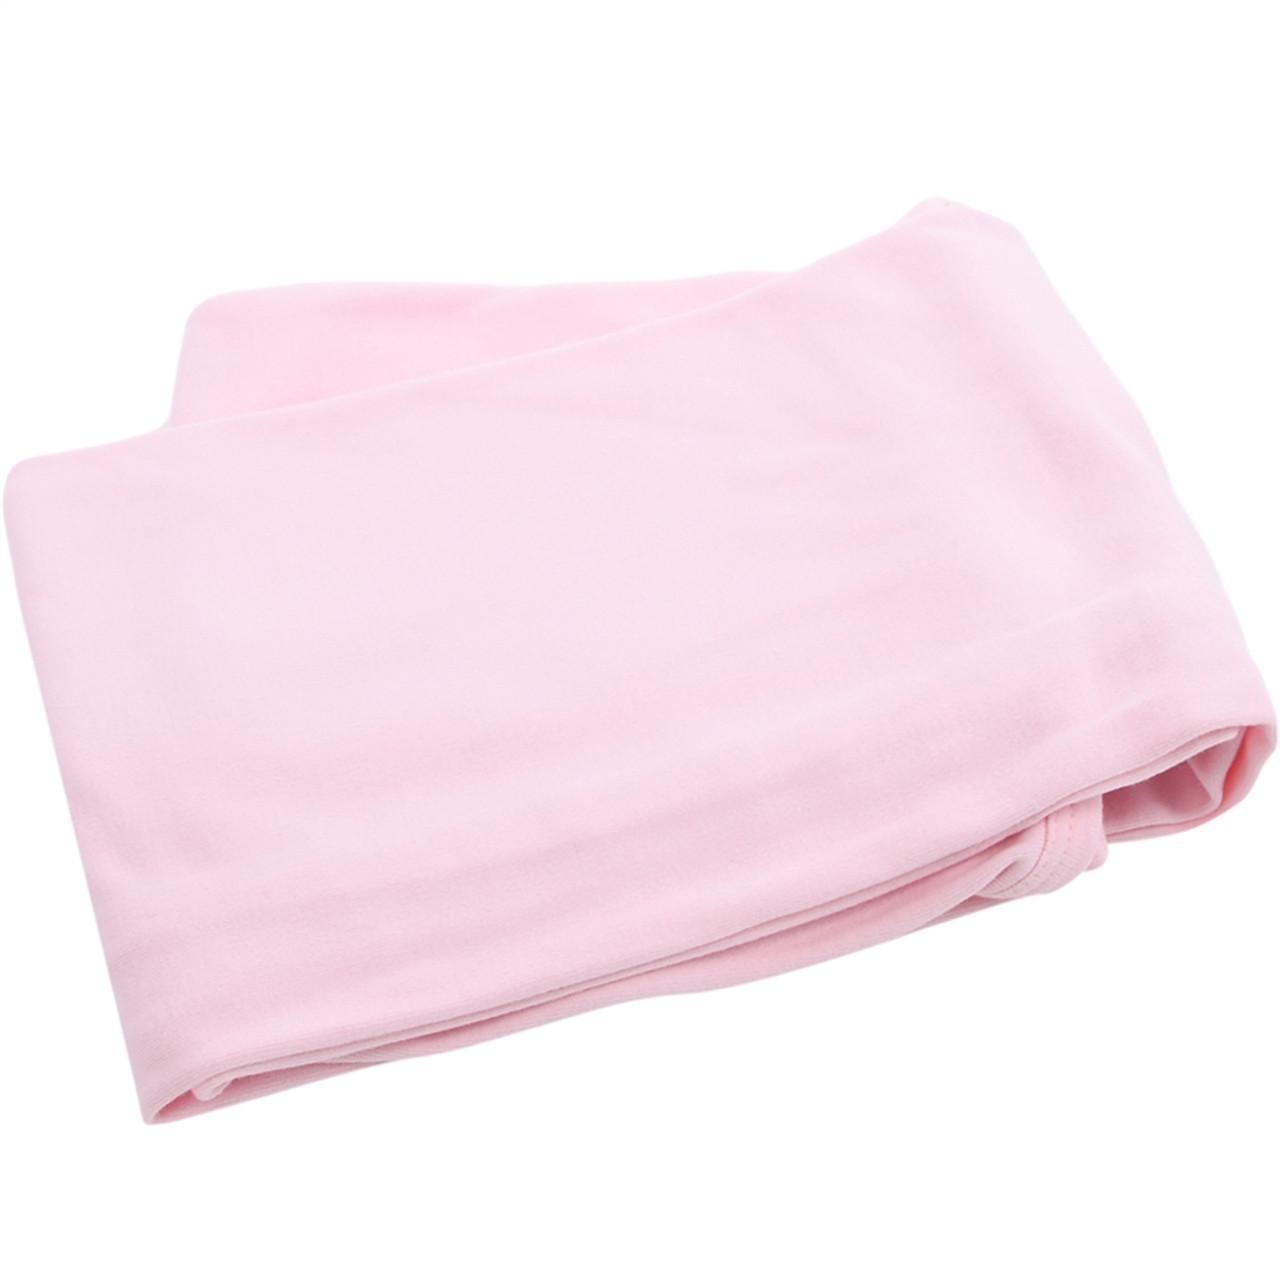 Organic Cotton Baby Blanket - Pink